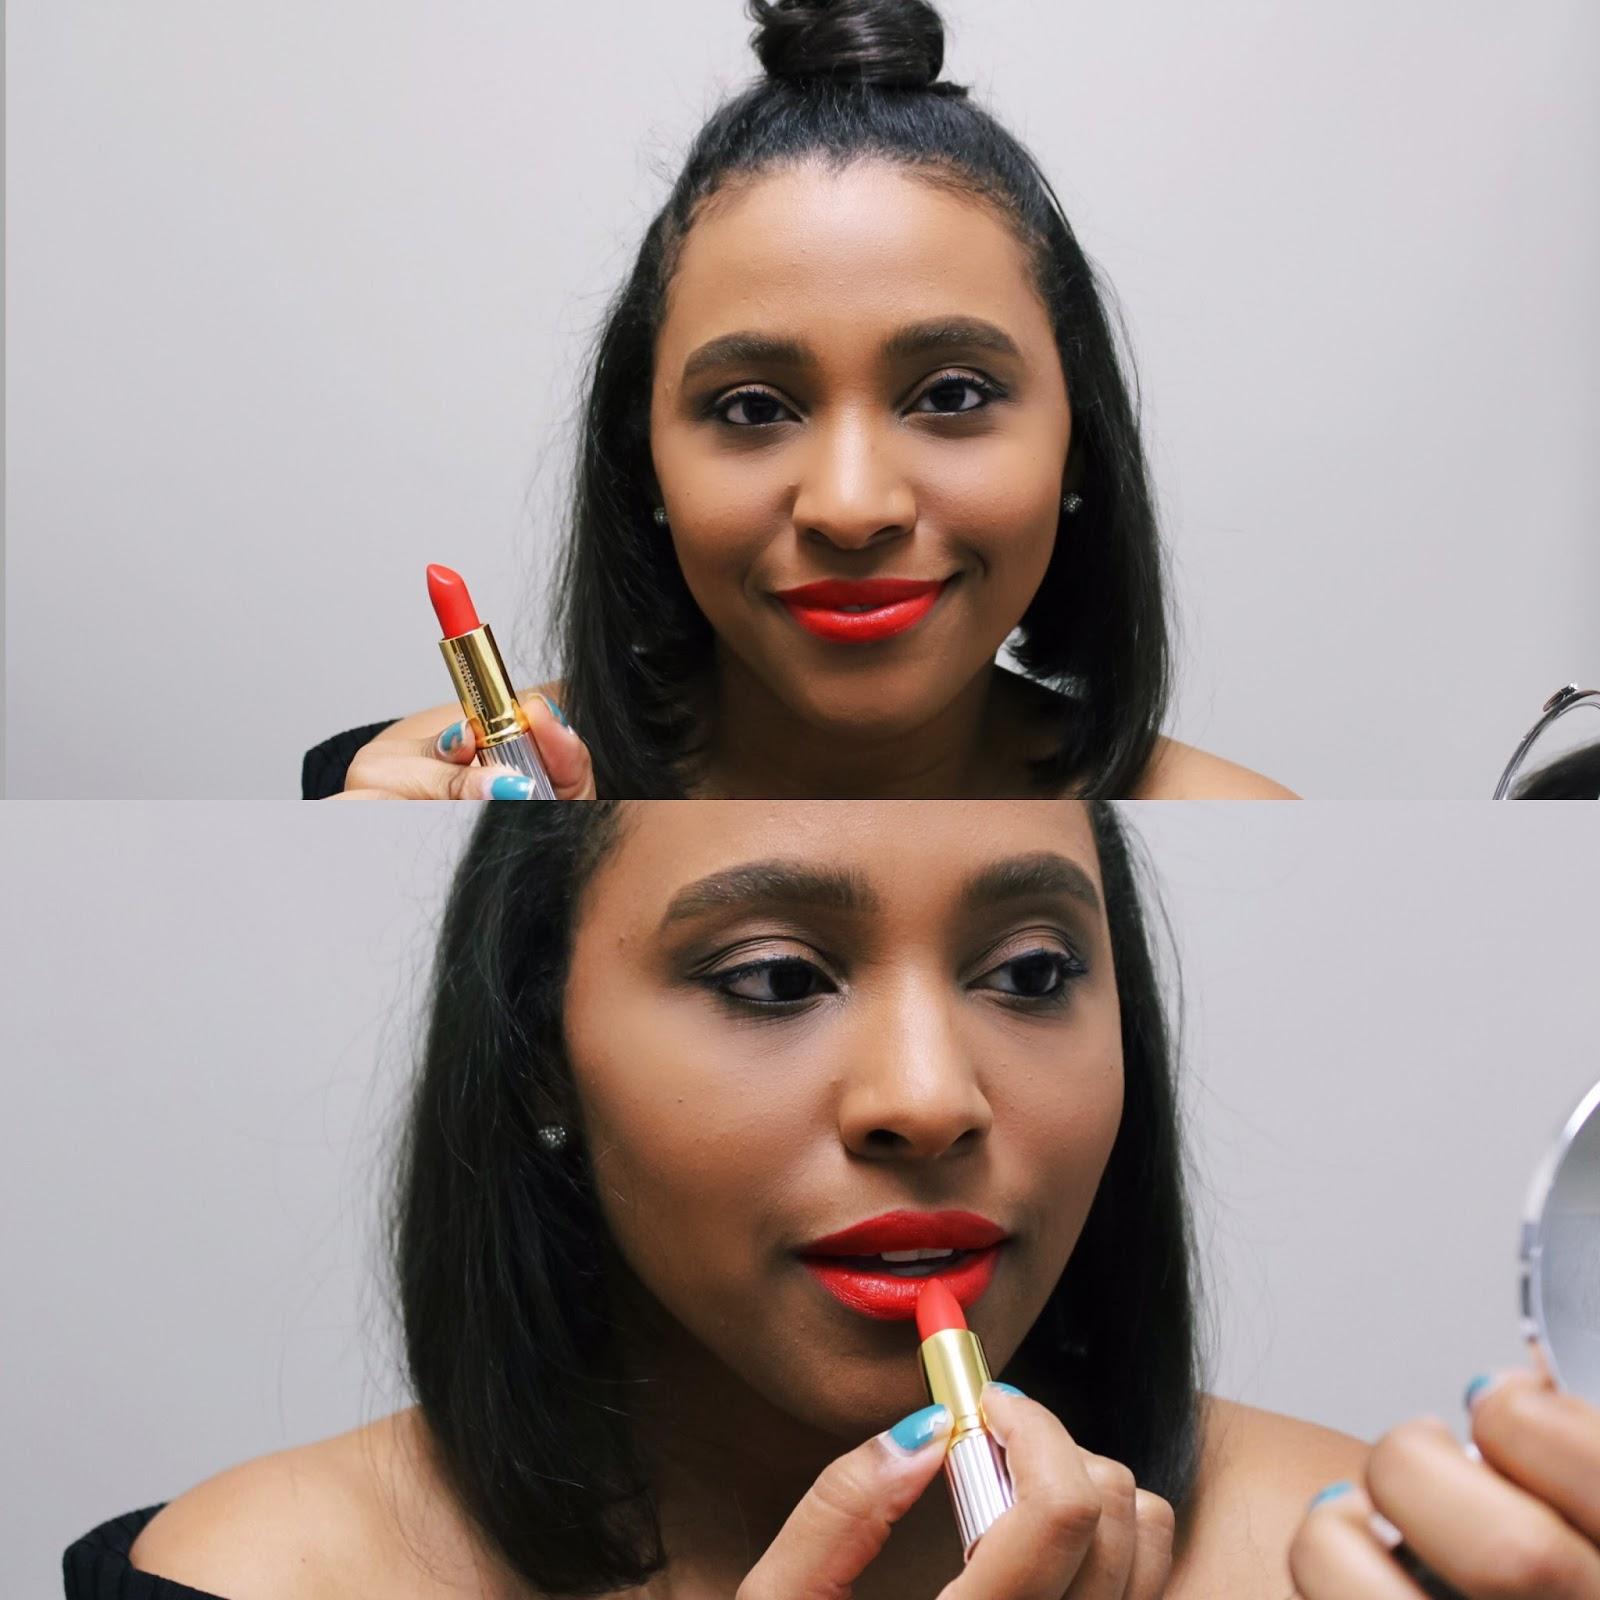 La Bella Donna, mineral based makeup, linea mineral, makeup, lipstick, lipstick crayon, spring makeup looks, red lipstick, nude lipstick, pink lipstick